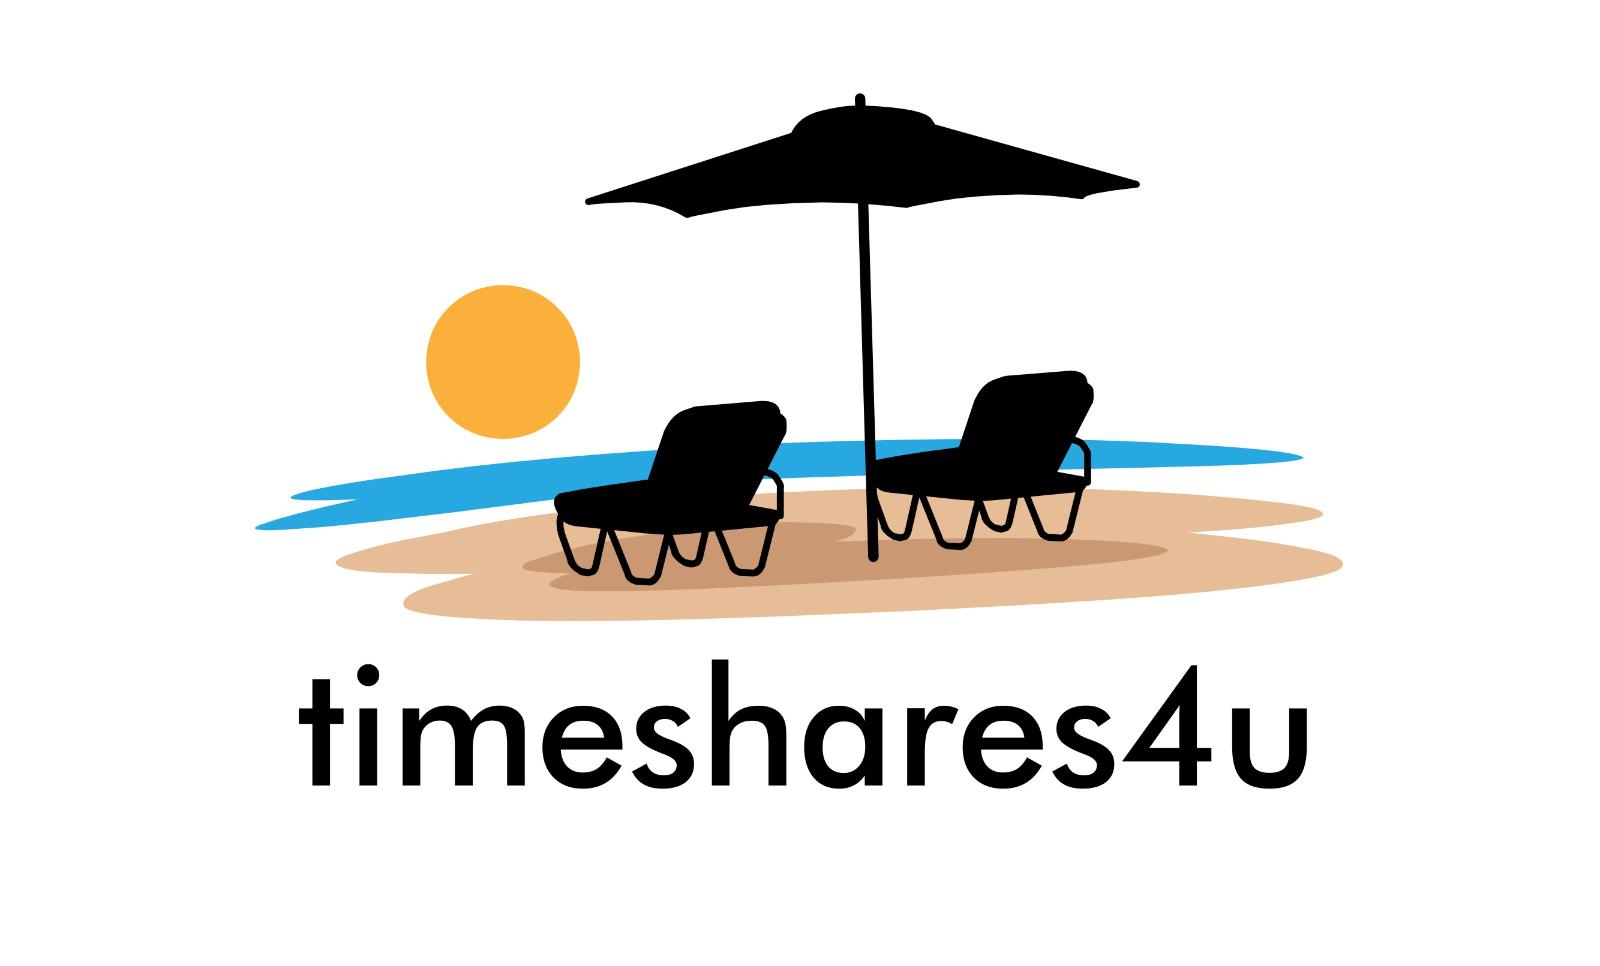 SILVER LAKE RESORT TIMESHARE 2B/2B 89,000 RCI PTS FREE 2019 USE KISSIMMEE, FL  - $1.29